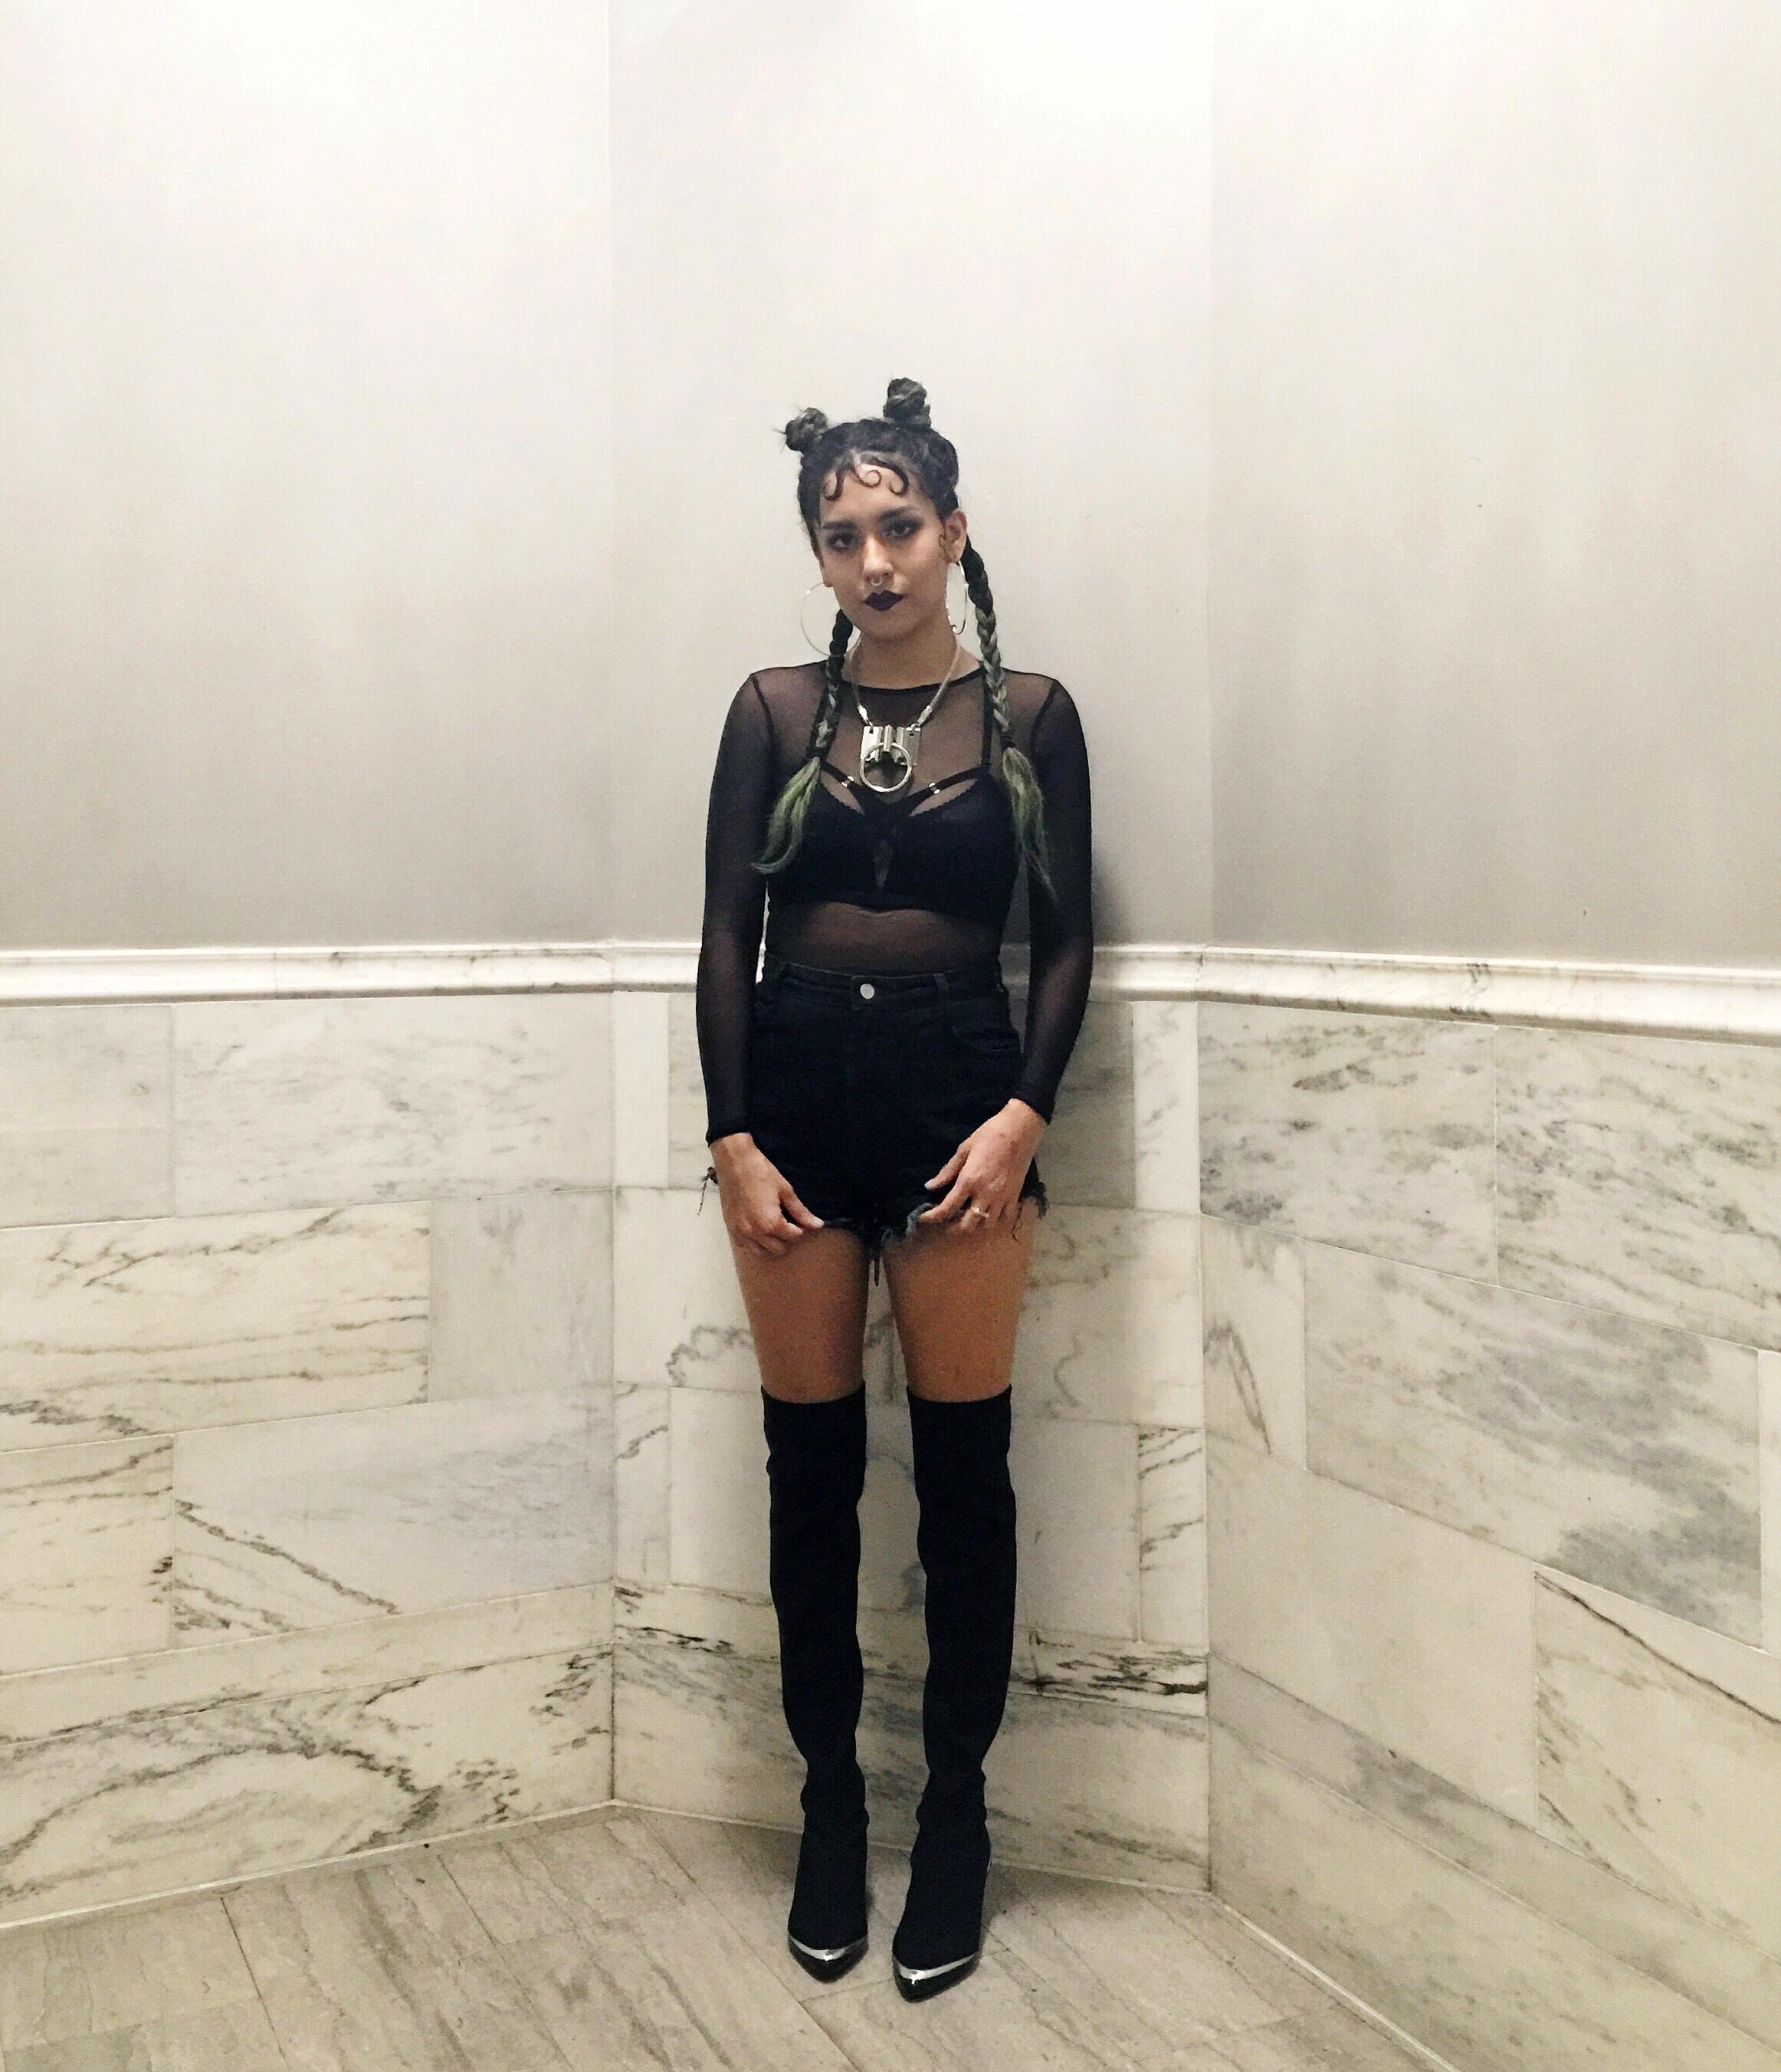 FKA Twigs Halloween Costume